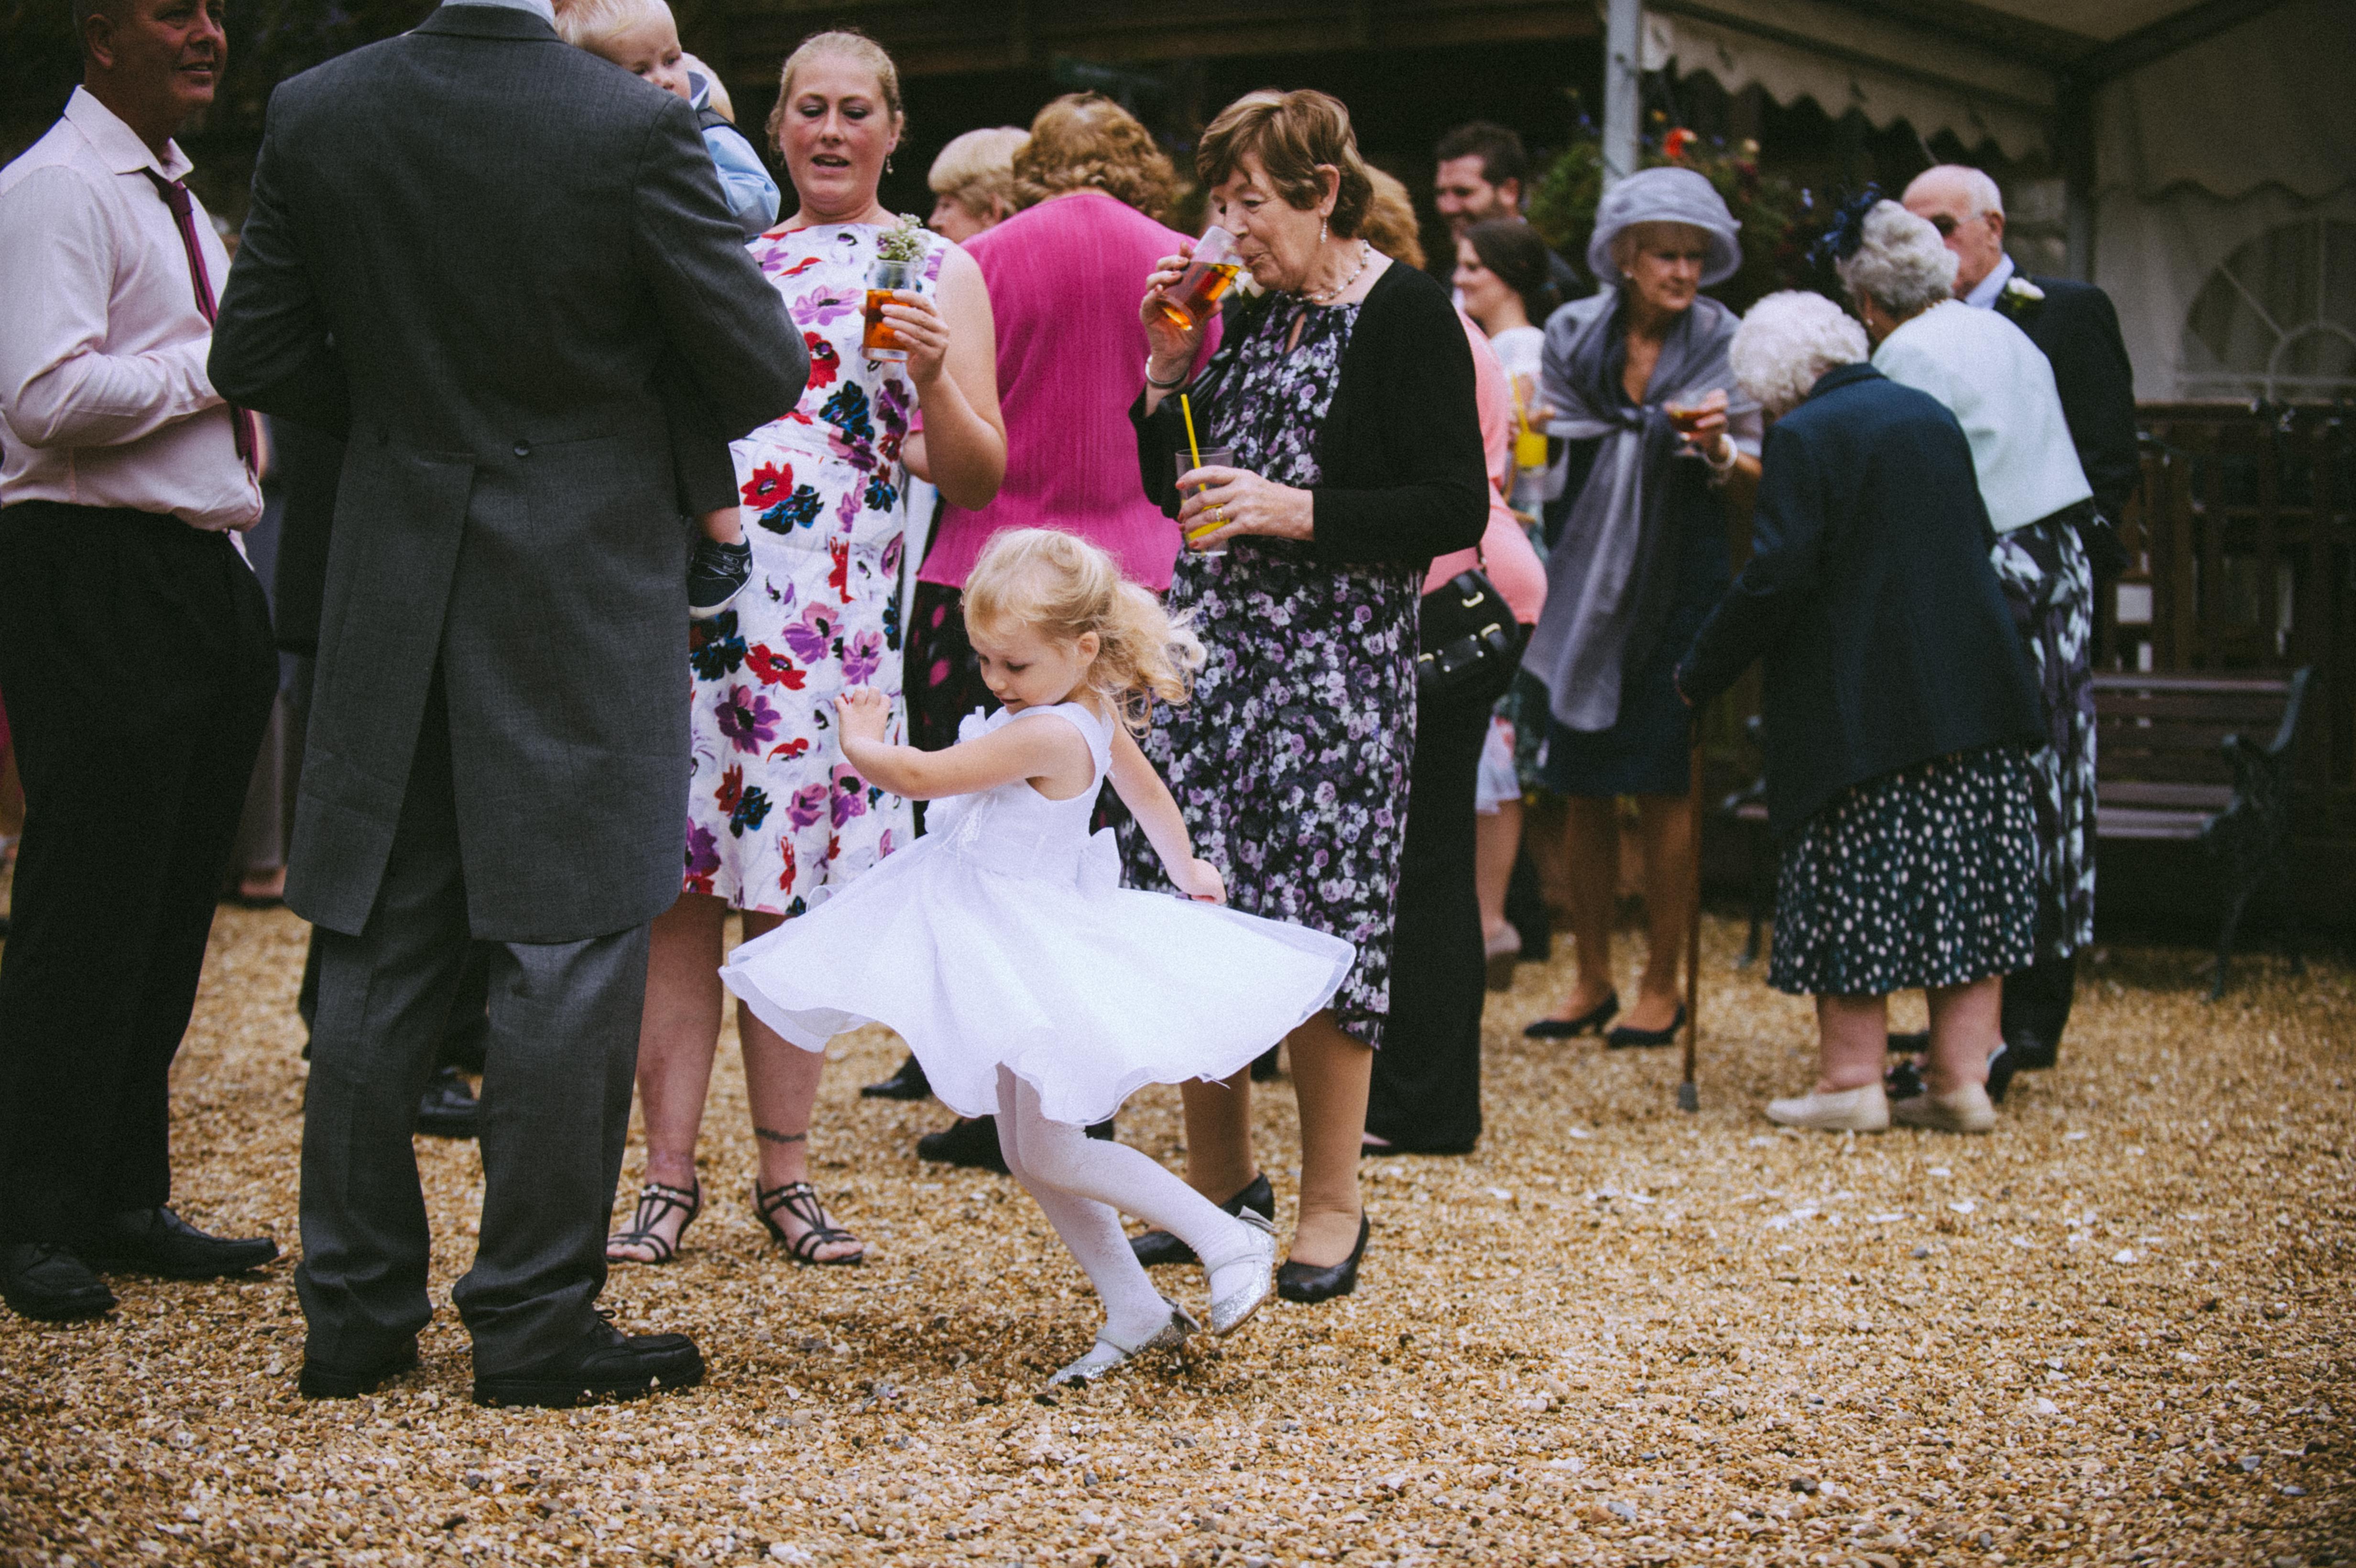 wedding photographers devon little girl.jpg